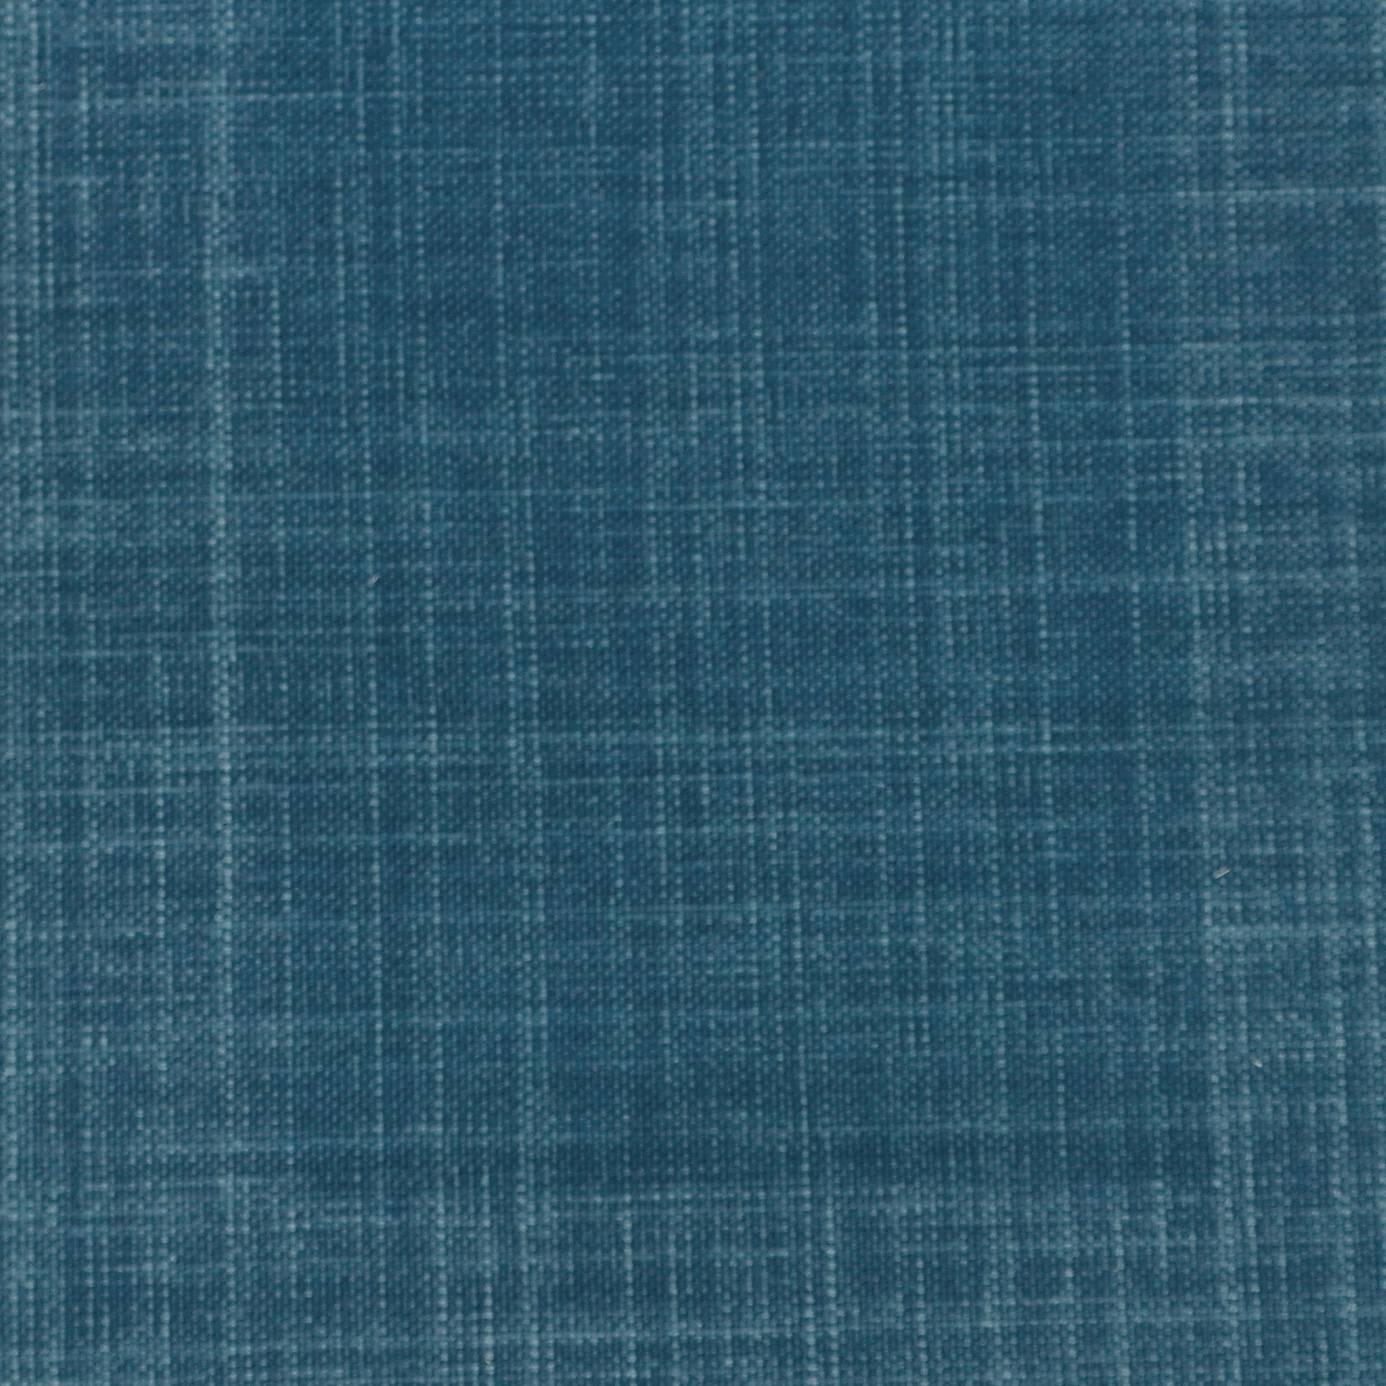 Dune Fabric - Petrol Blue (7490/56) - Romo Dune Fabrics Collection for Blue Curtain Fabric Texture  111bof